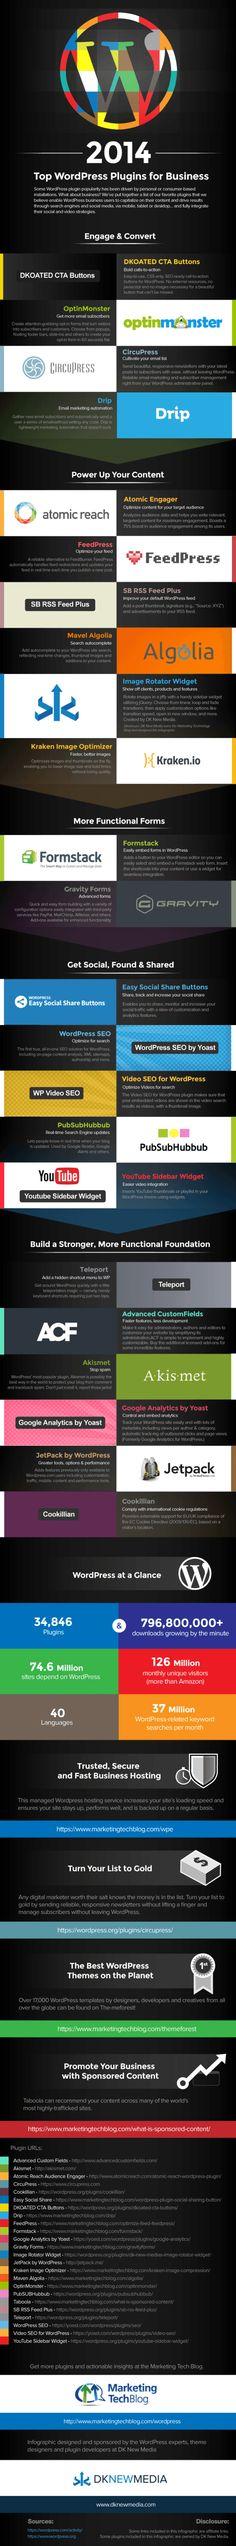 Los mejores plugins de WordPress para empresas en 2014 #infografia #infographic #socialmedia